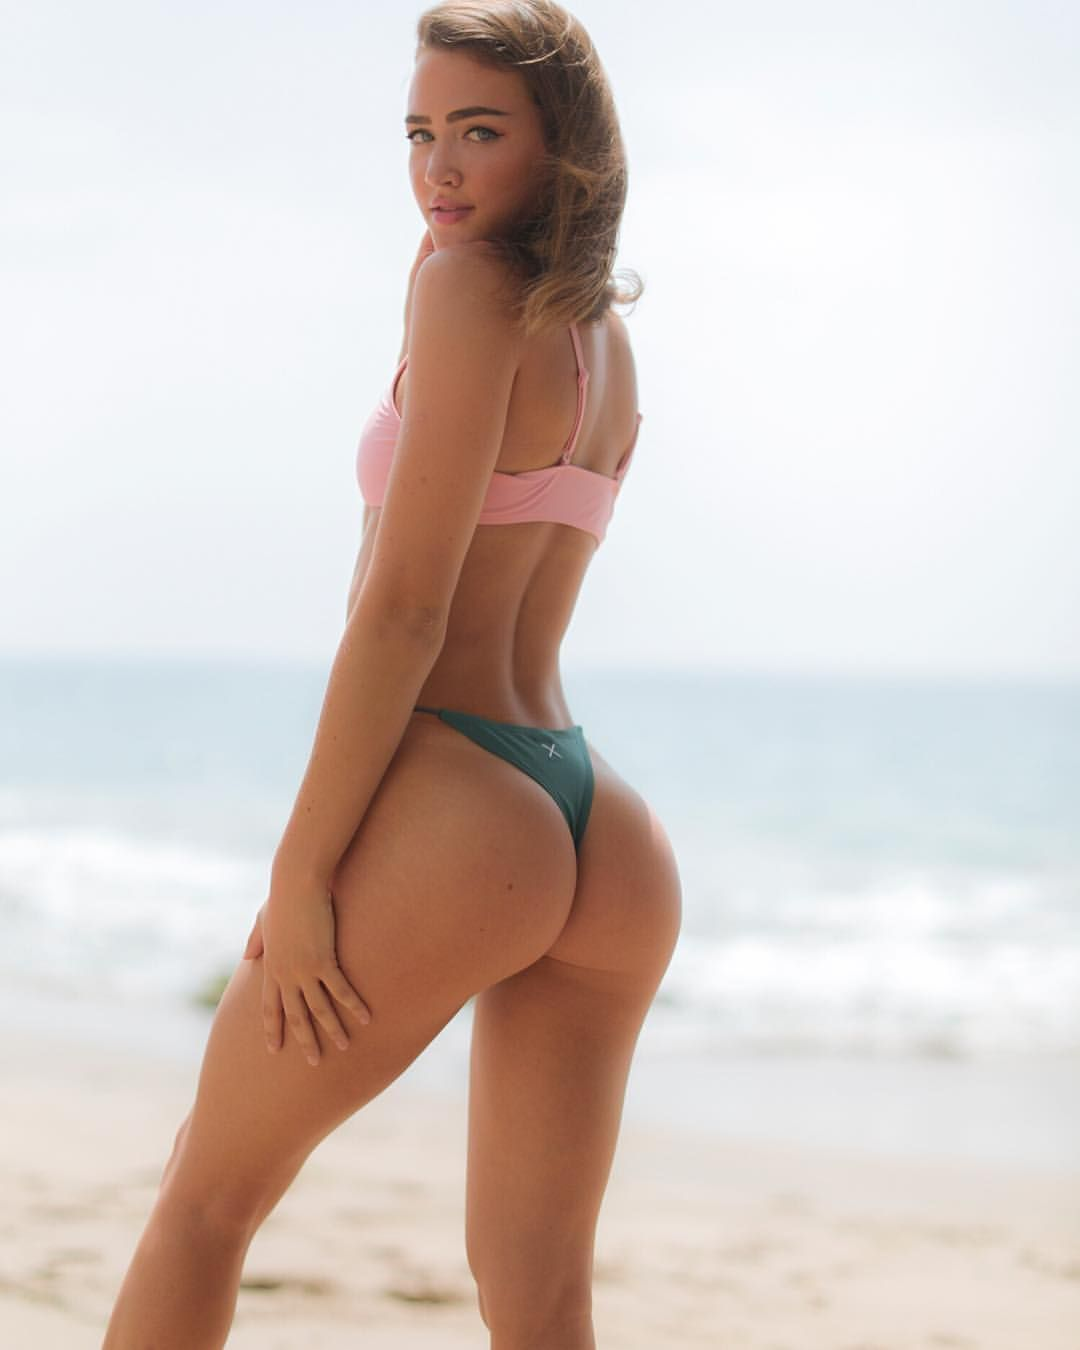 anal-sexiest-thong-bikini-kings-tranny-surprise